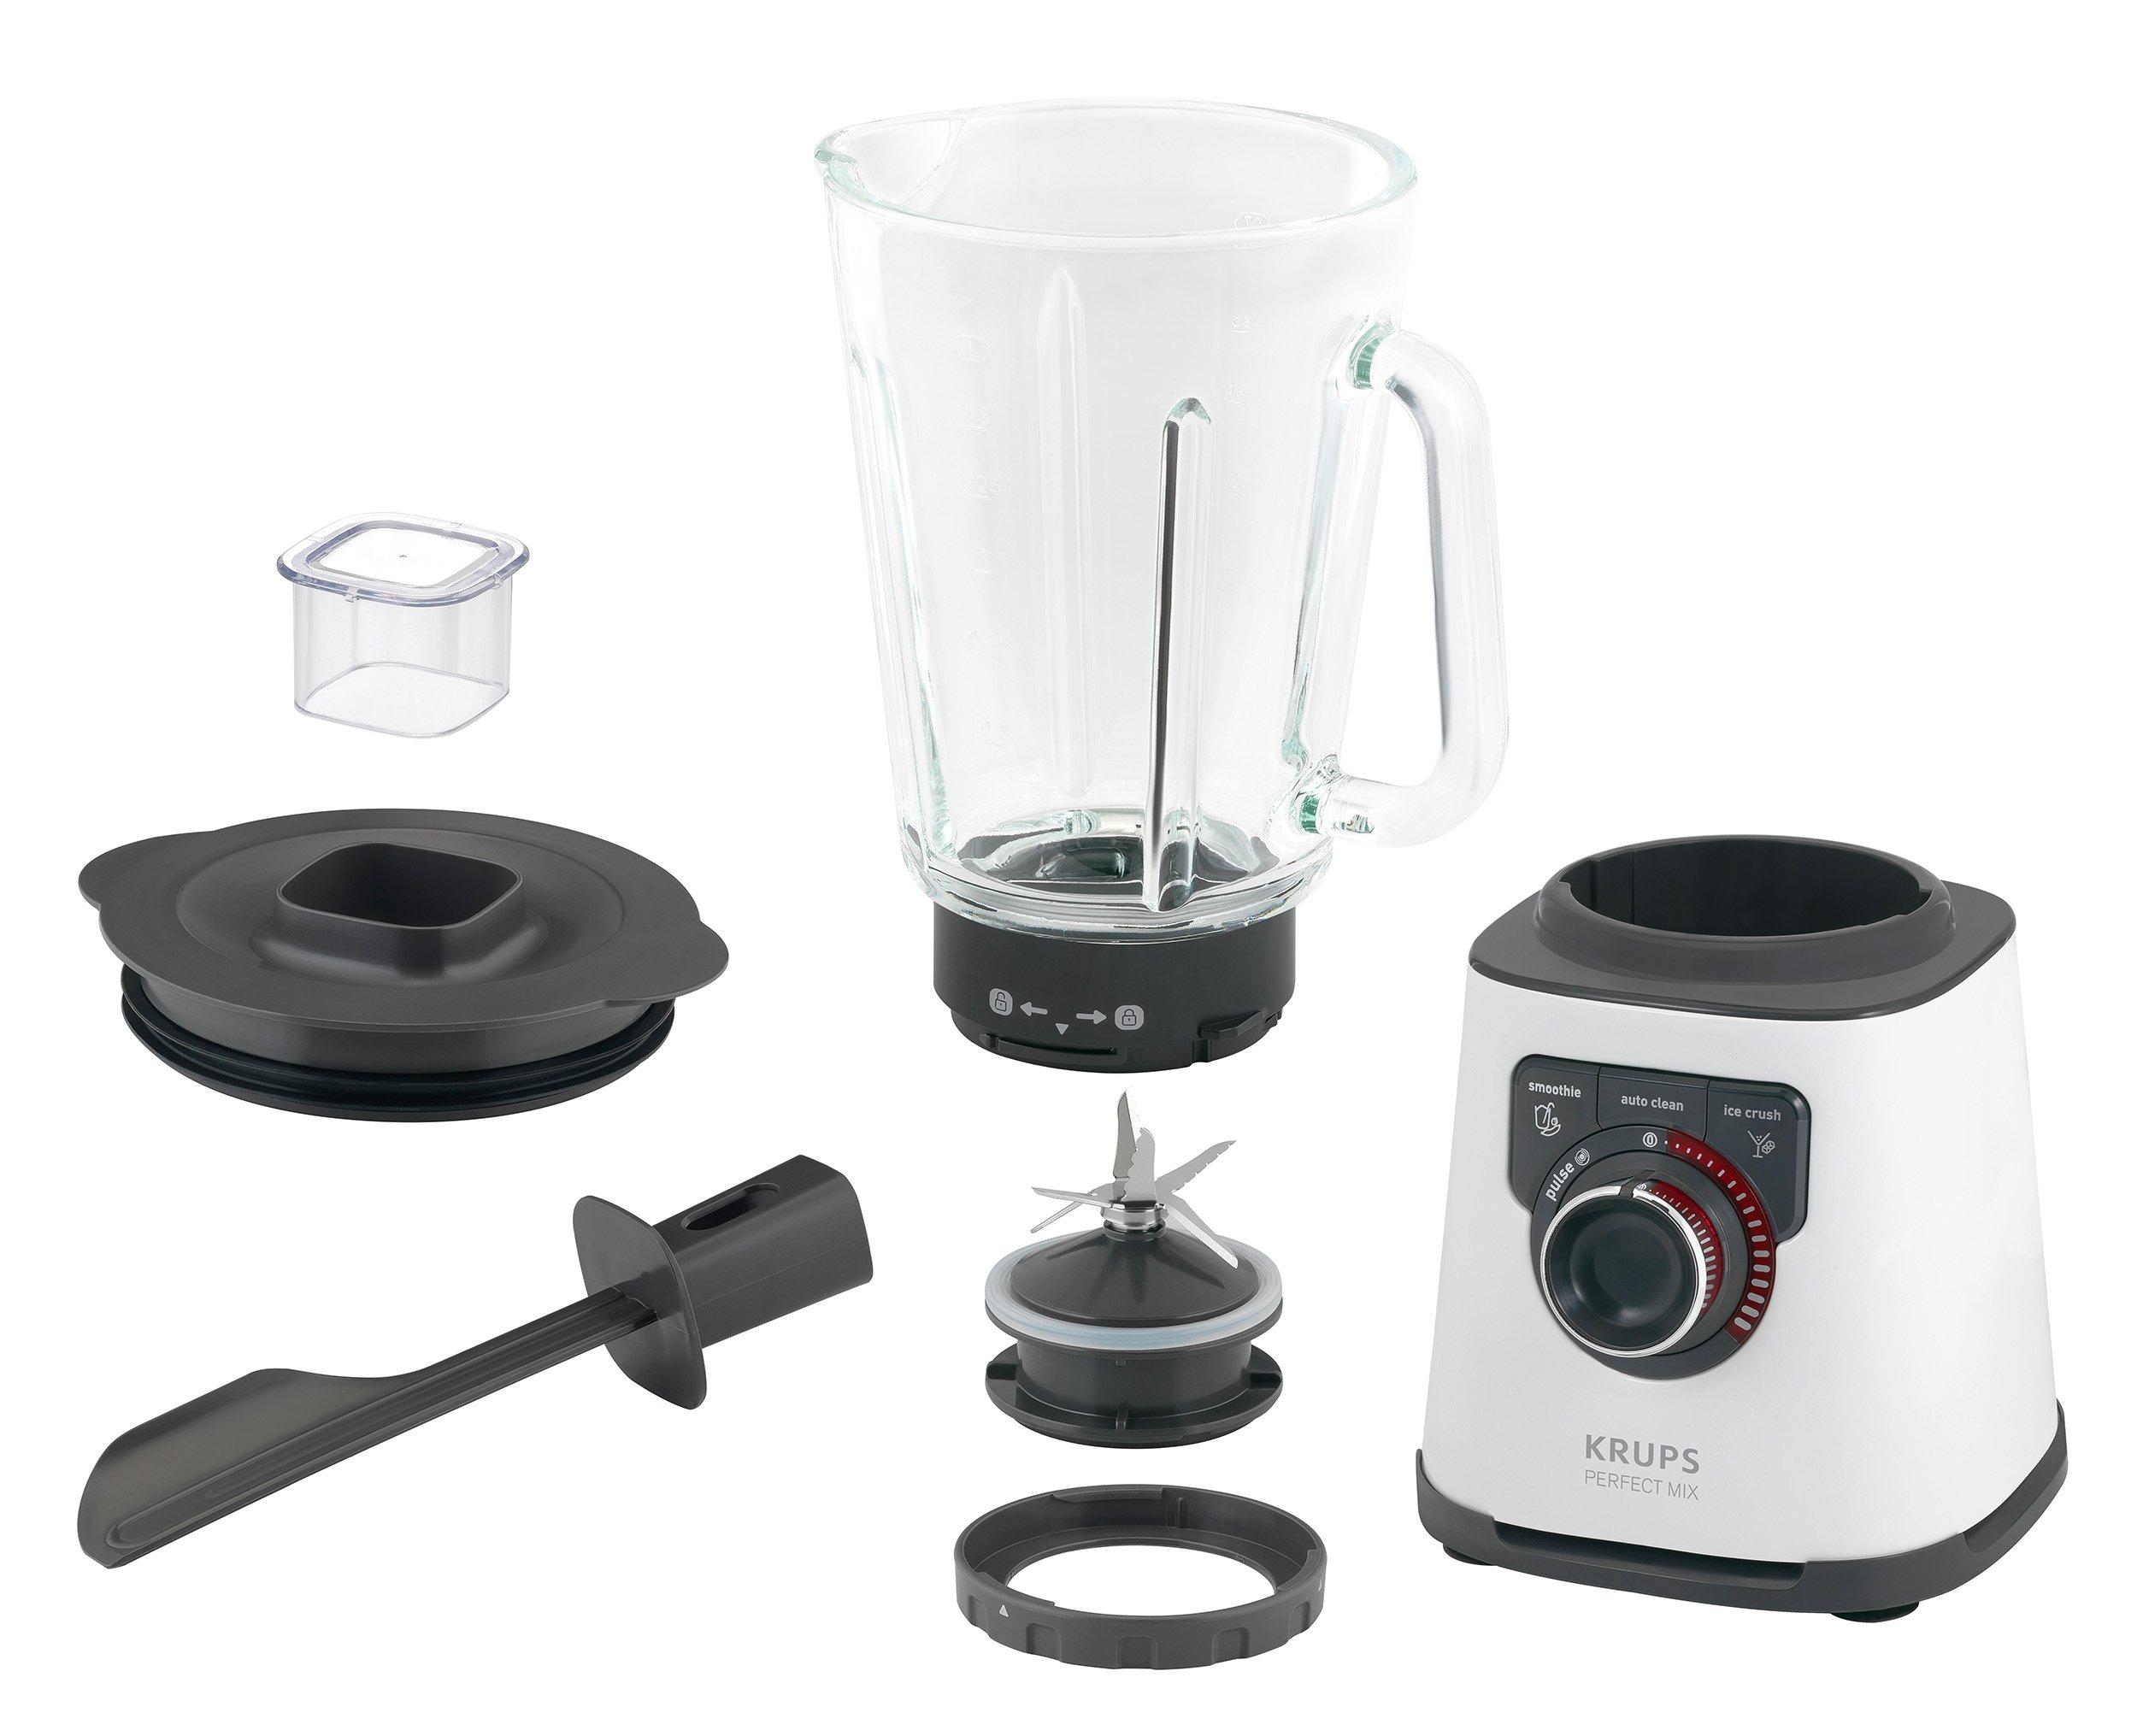 Krups-KB4031-Perfect-Mix-Highspeed-Standmixer-1200-Watt-15-Liter-Glasbehlter-Edelstahlmesser-Edelstahlschwarz